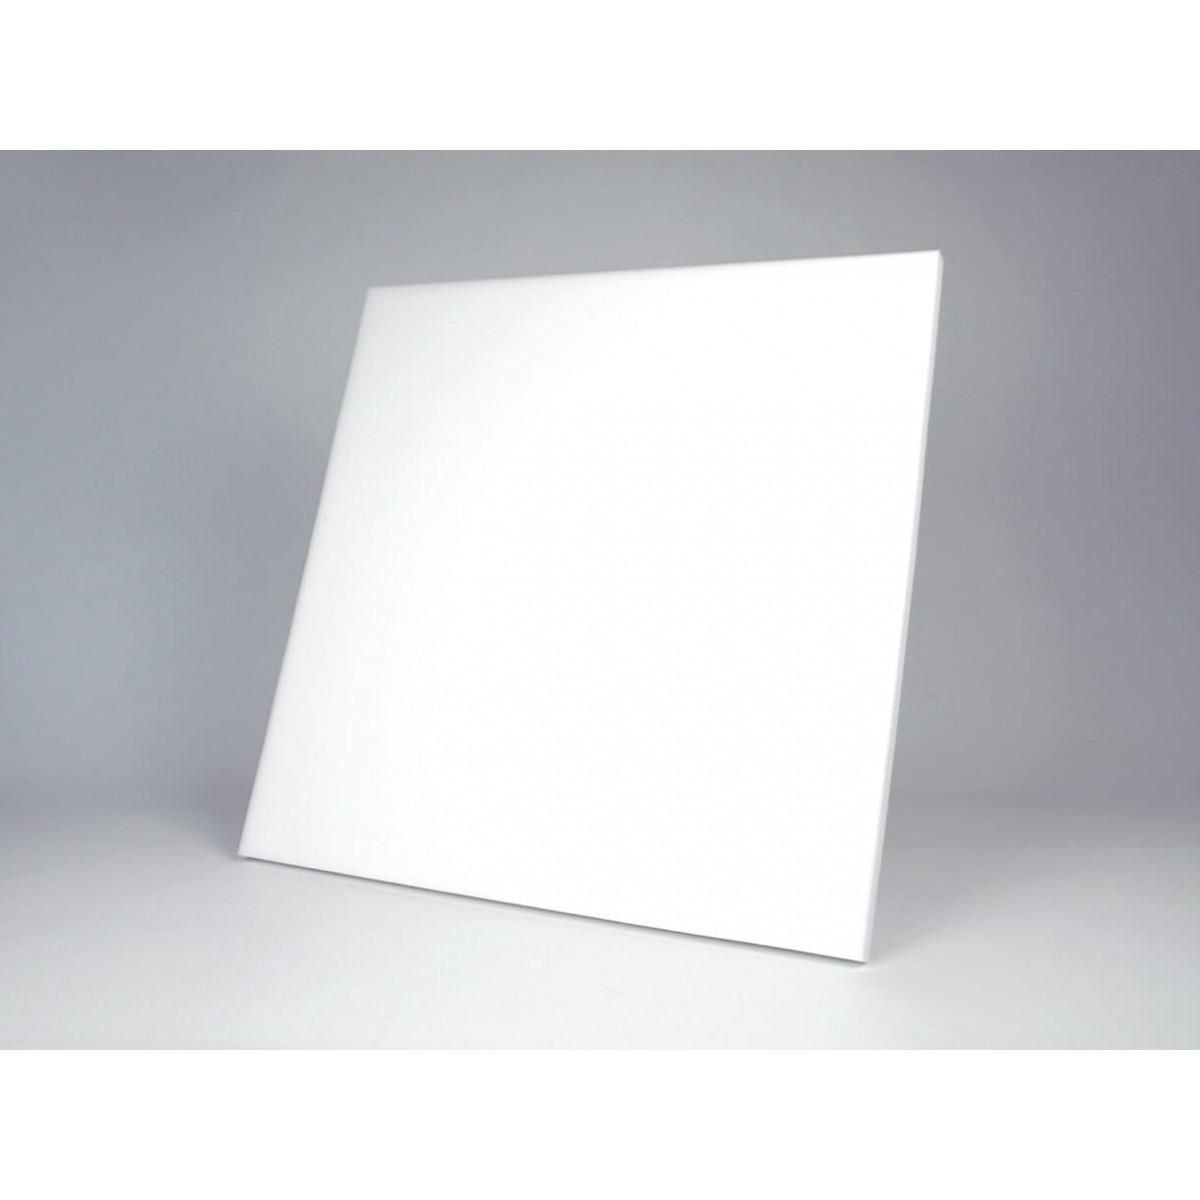 Panel acustico basotec white fabricado con espuma de resina de melamina en color blanco